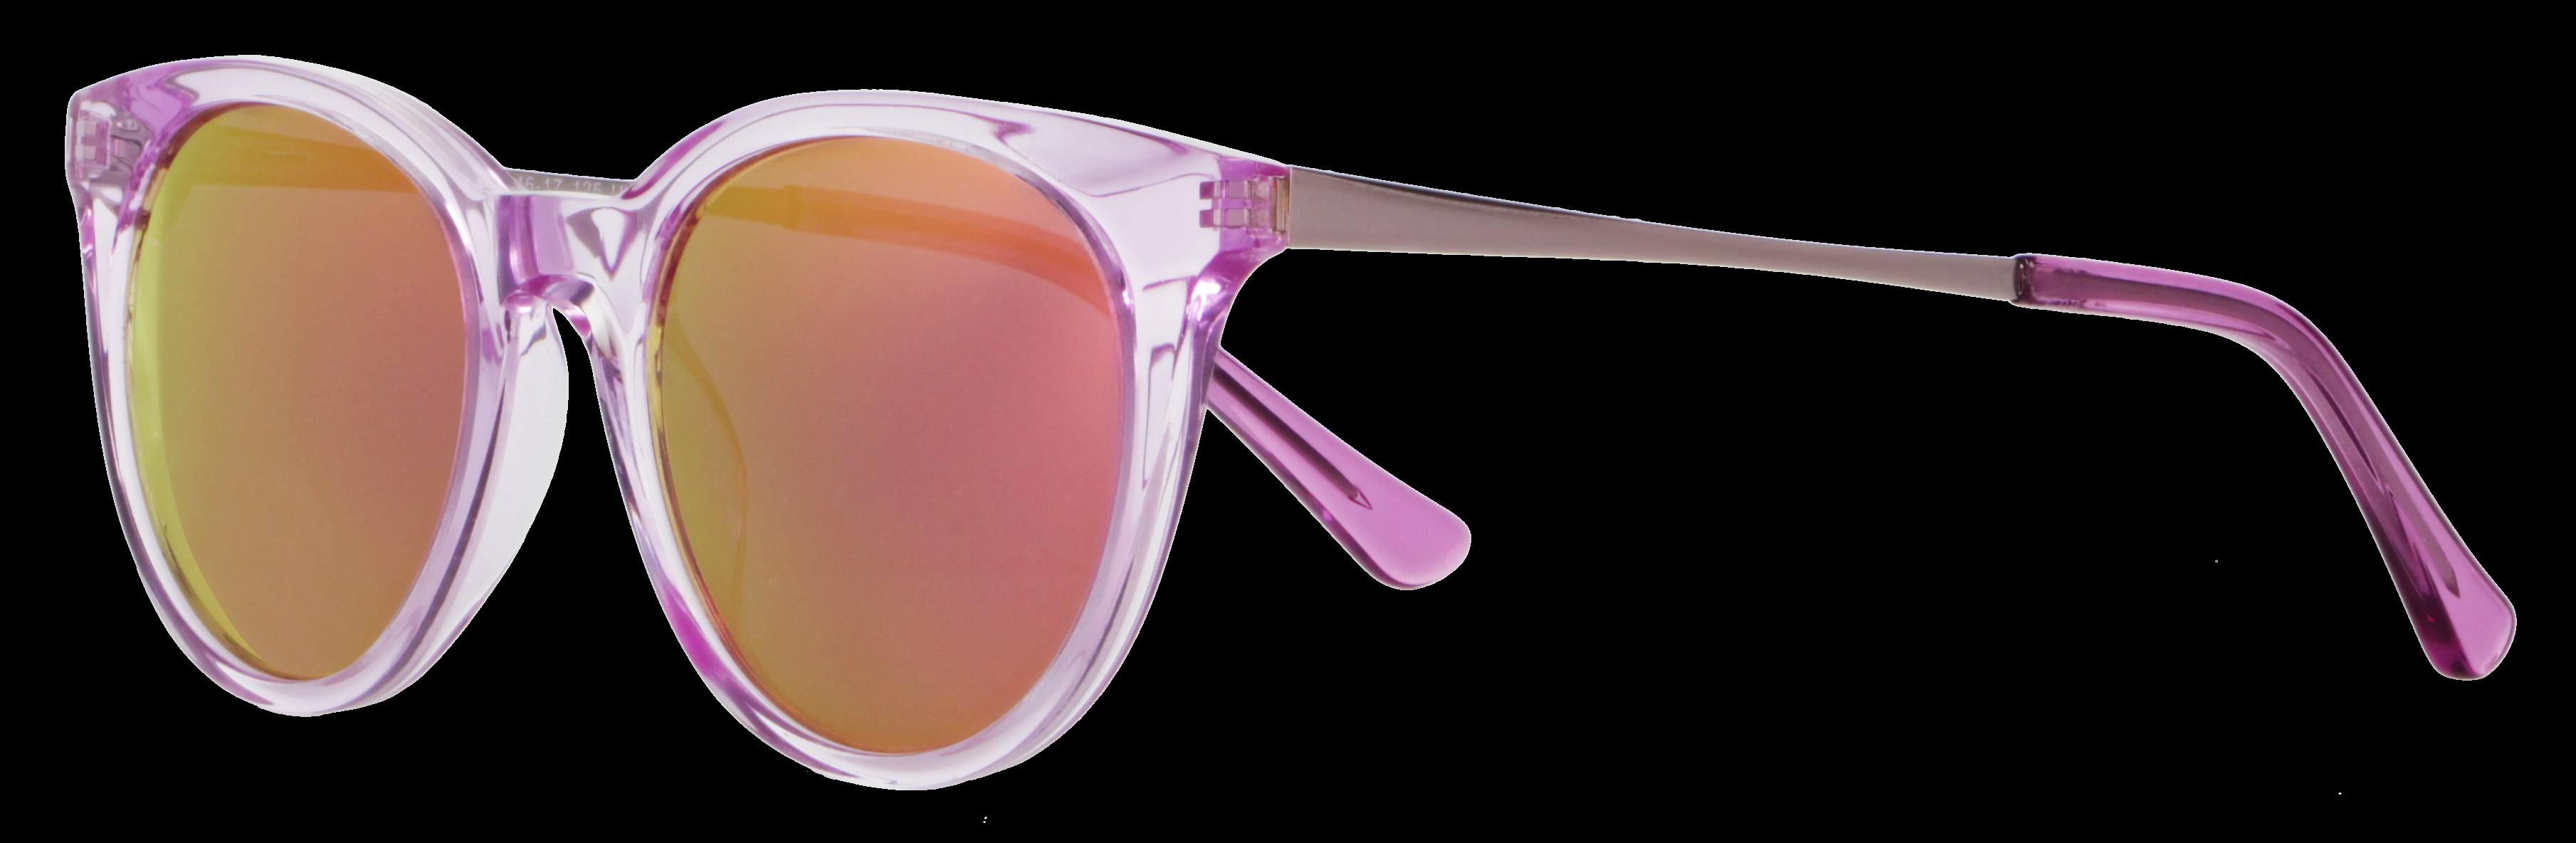 abele optik Kindersonnenbrille 717891